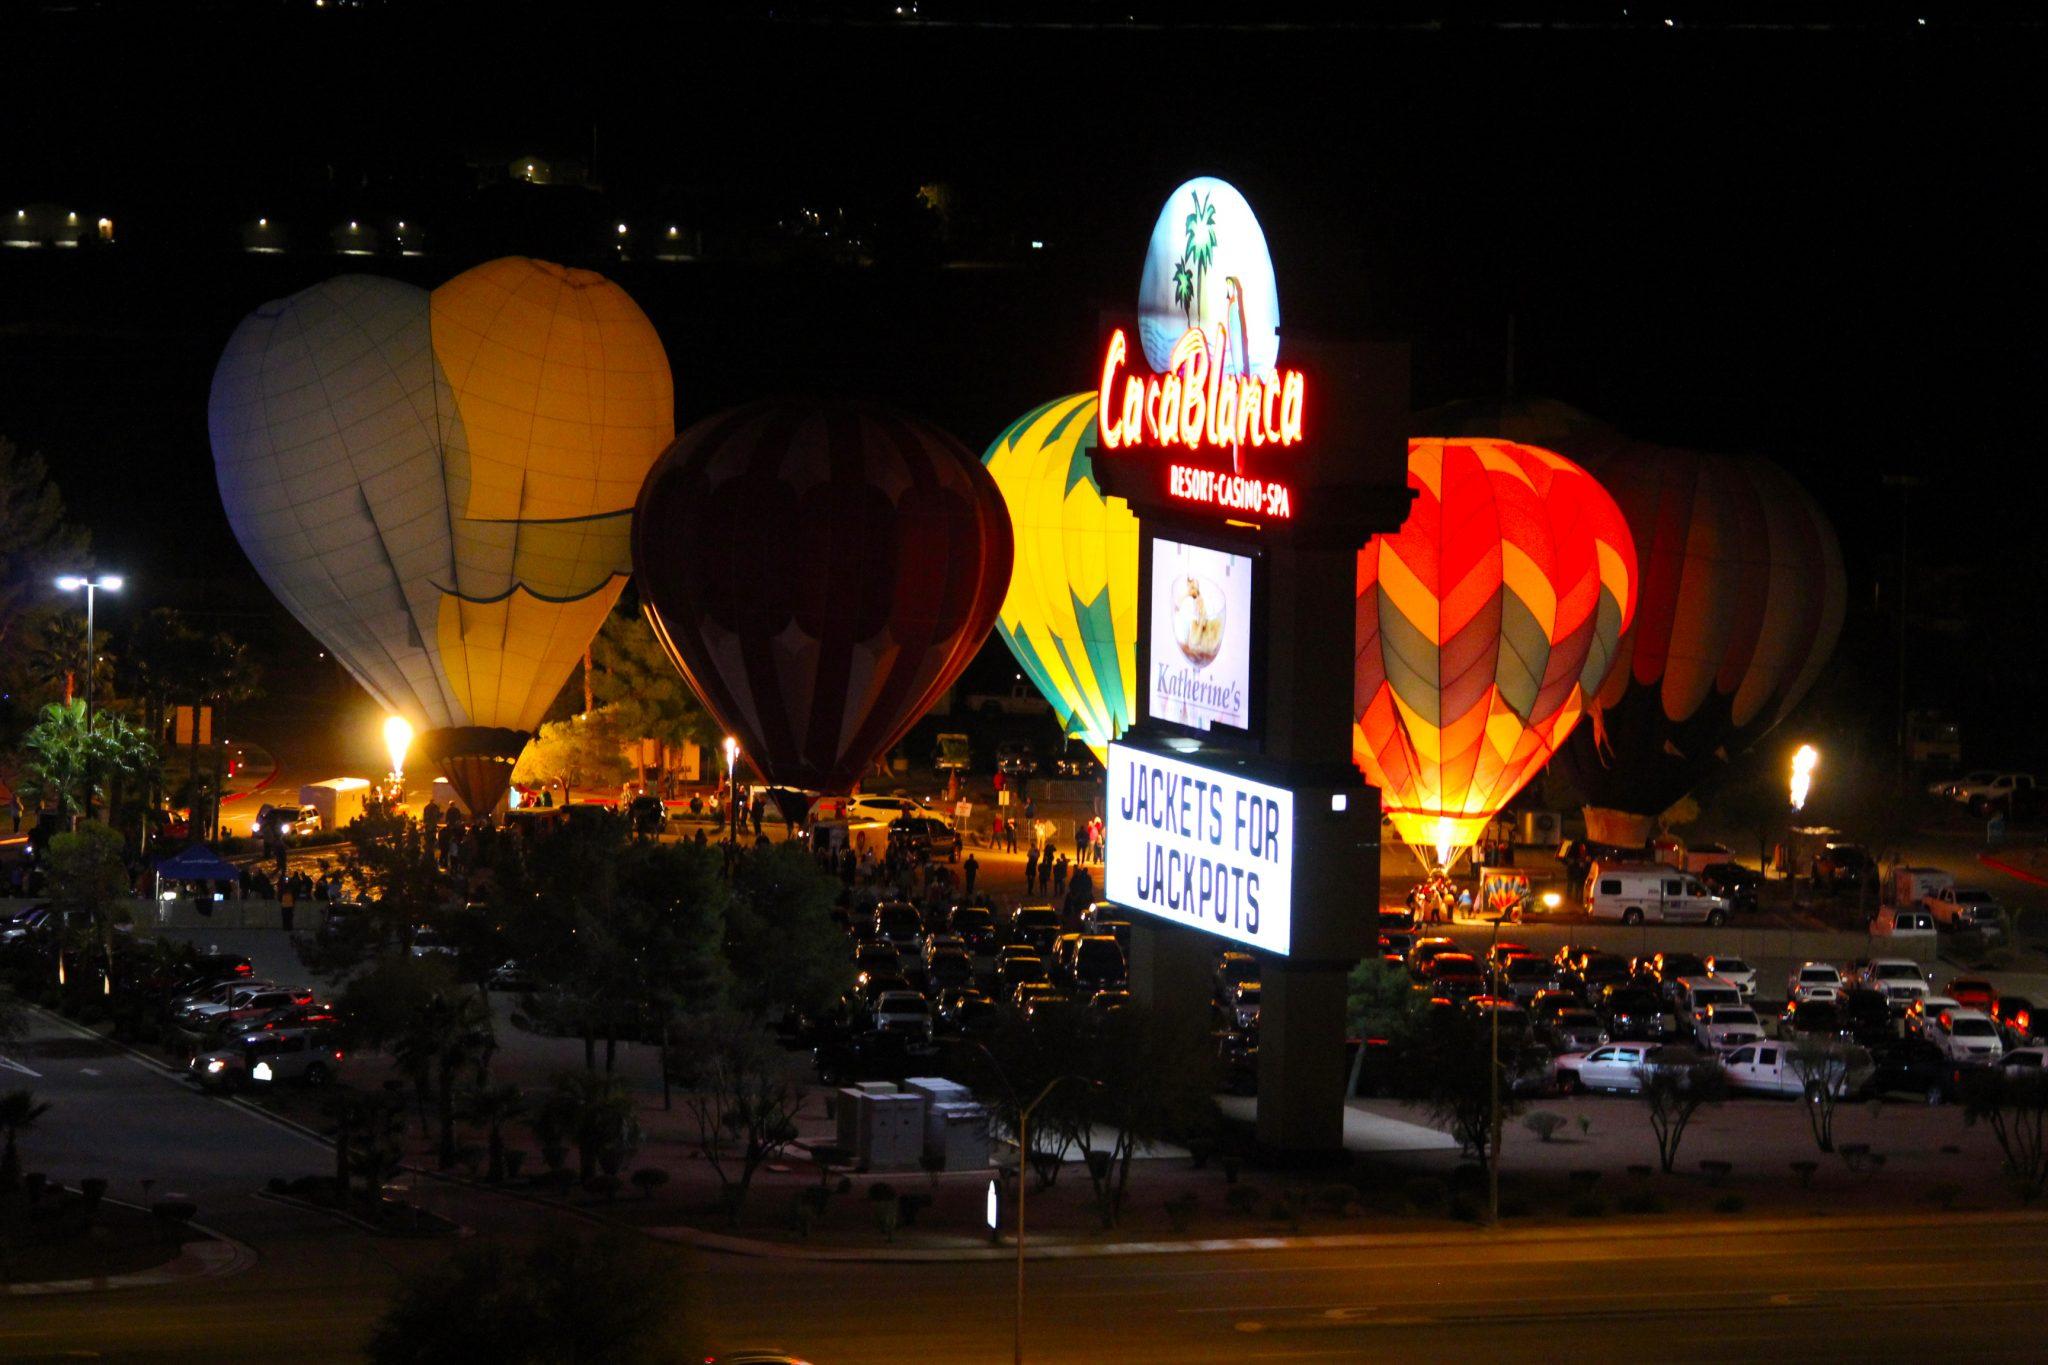 Hot Air Balloon Festival Schedule